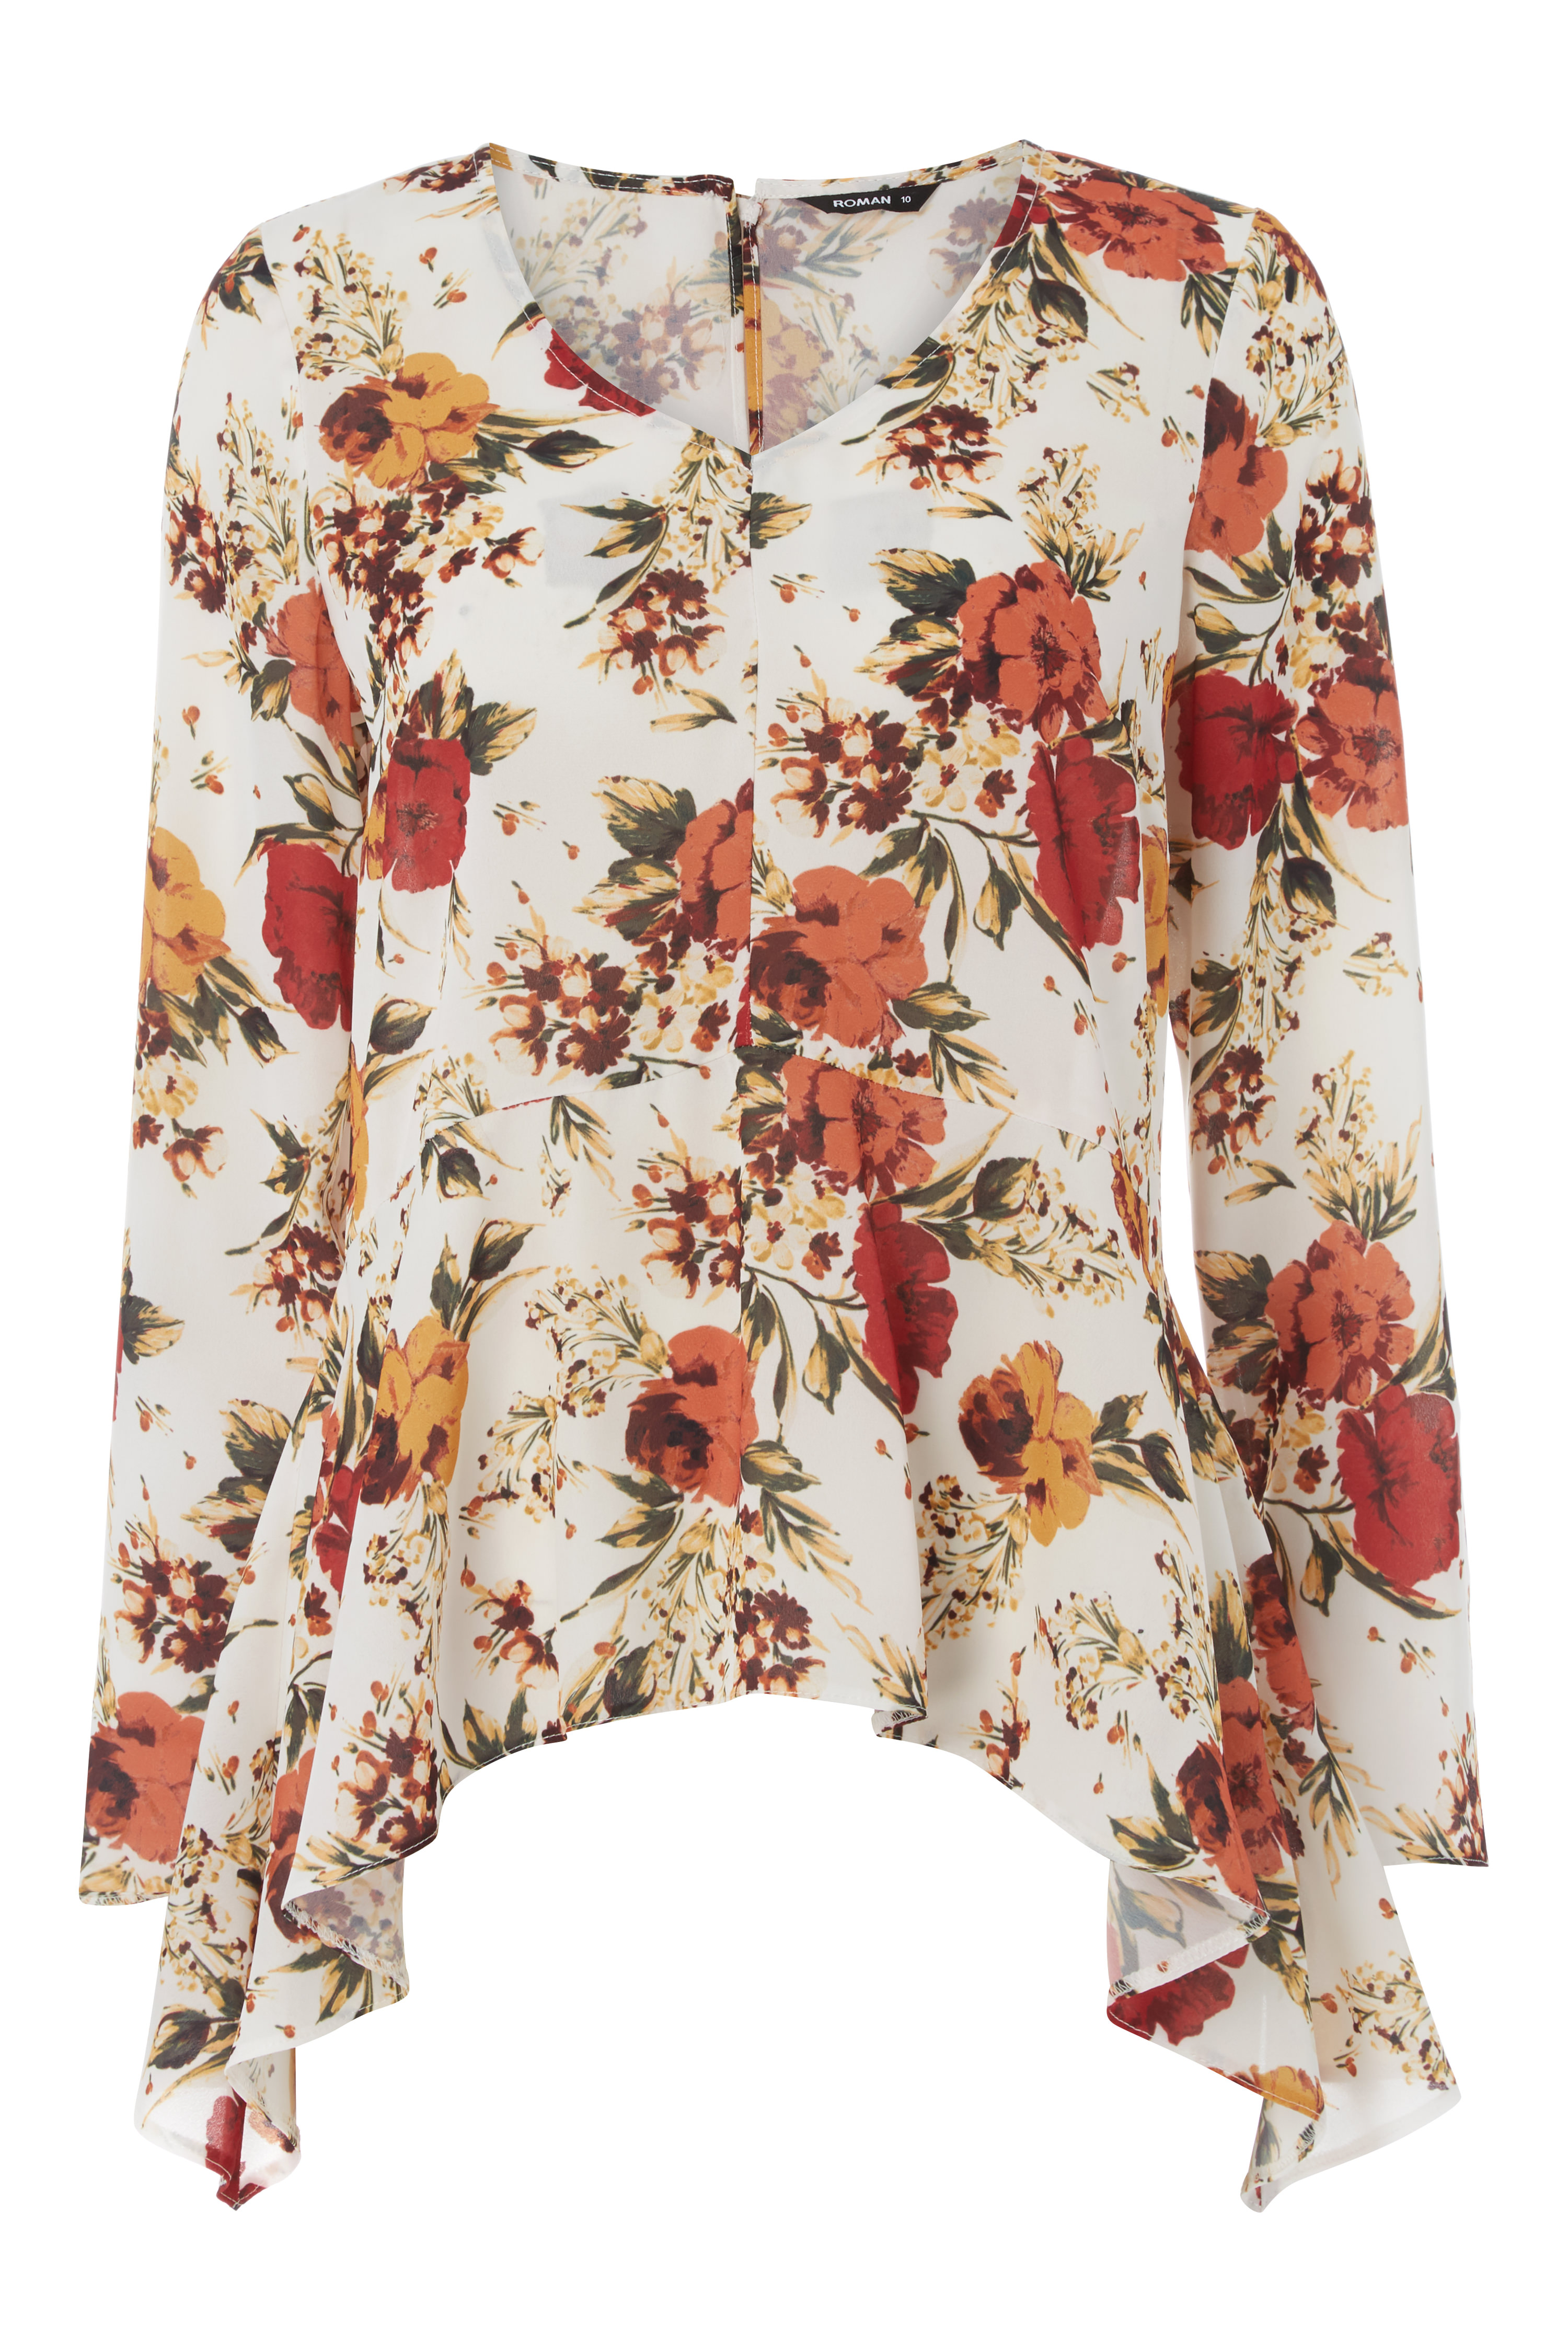 Roman-Originals-Femme-Boho-Peplum-Floral-Haut-Tailles-10-20 miniature 9